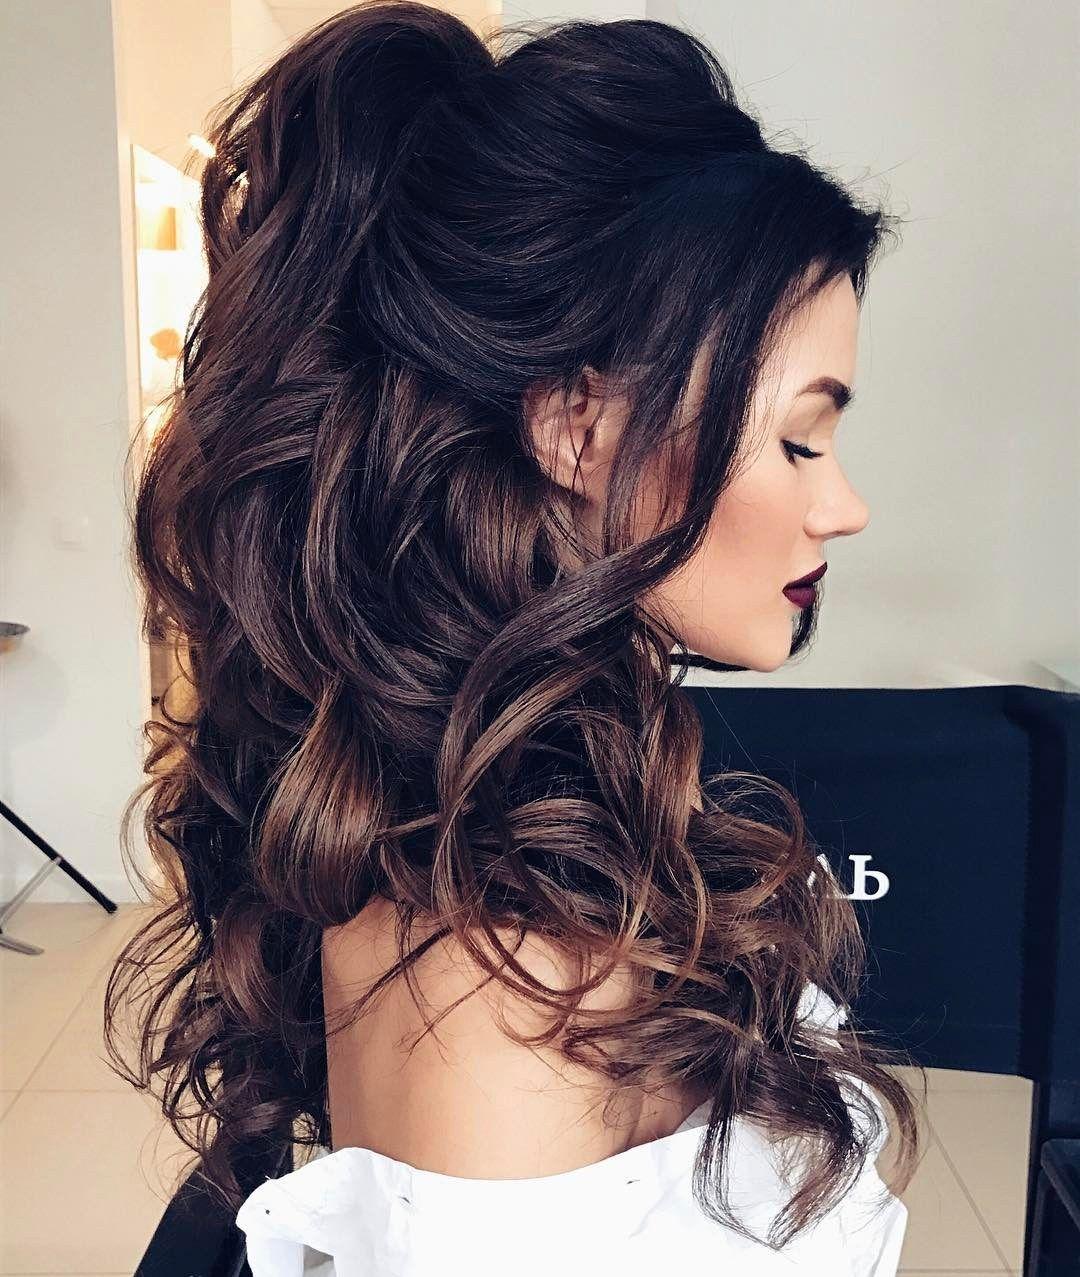 15 Prom Hair Ideas To Get You Super Pretty Moosie Blue Hair Styles Long Hair Styles Wedding Hair Inspiration